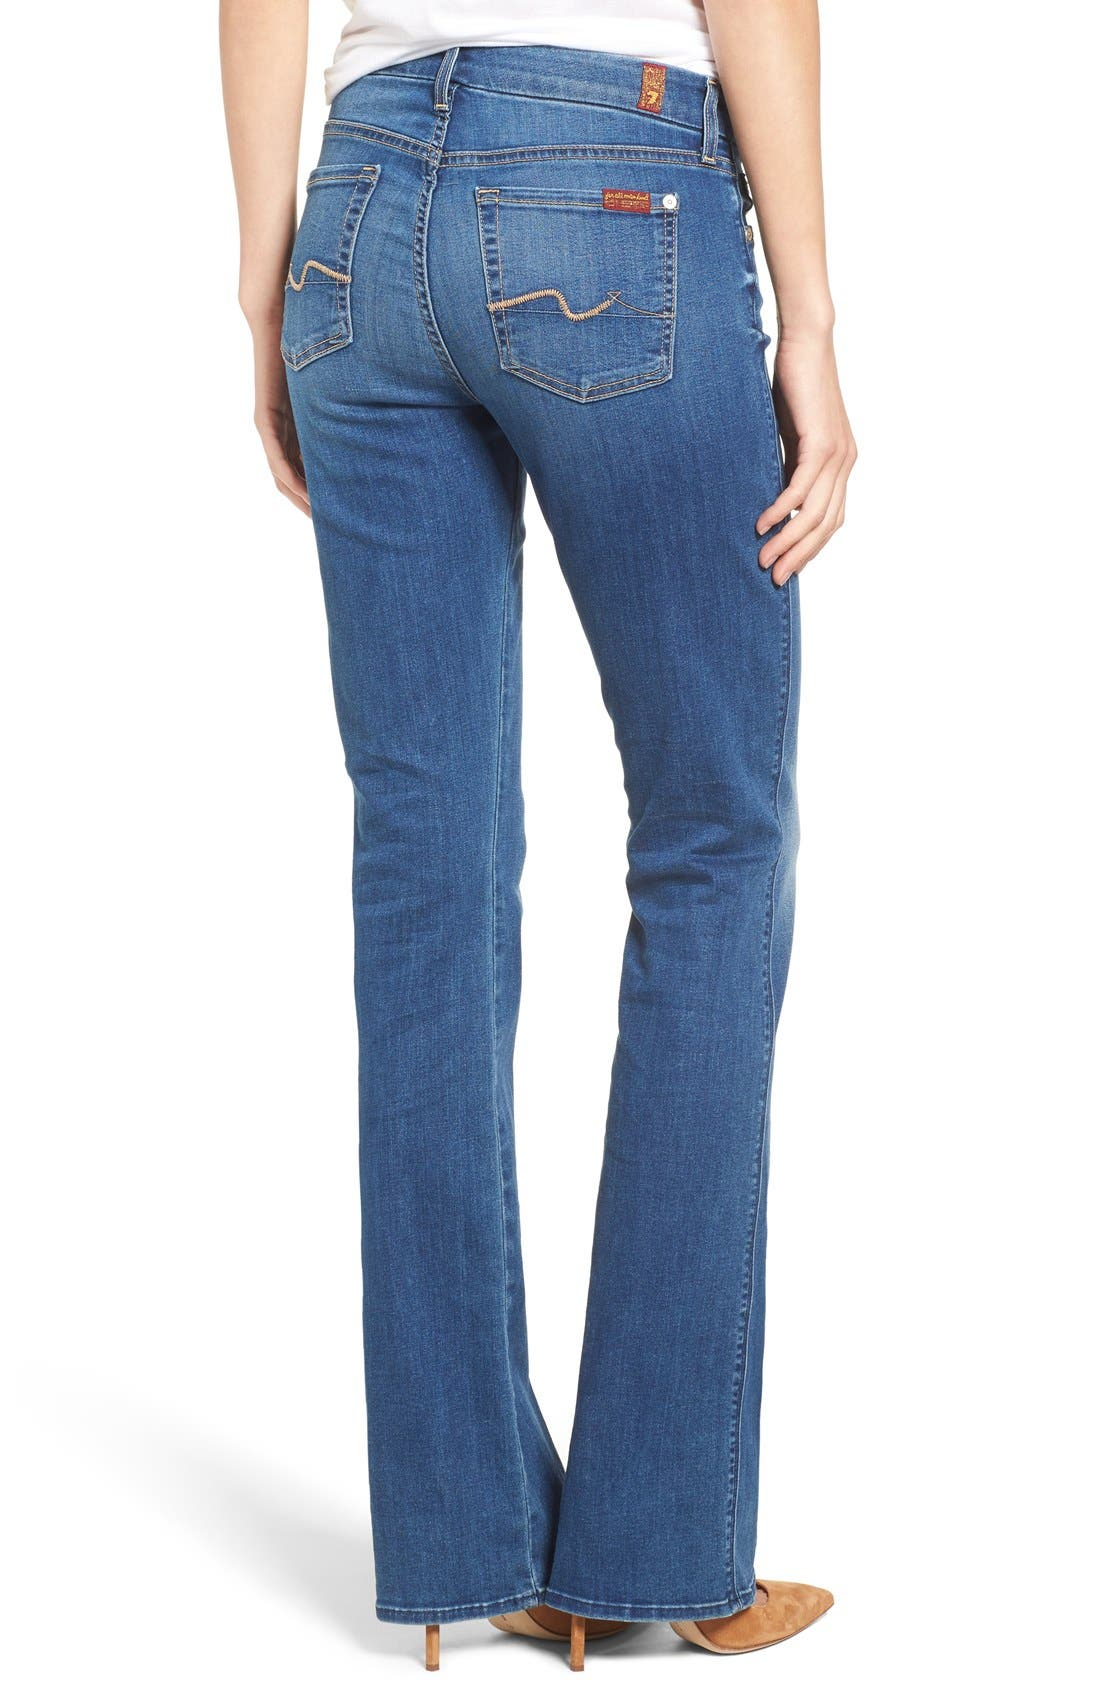 Alternate Image 2  - 7 For All Mankind® 'b(air) - Kimmie' Straight Leg Jeans (Duchess)